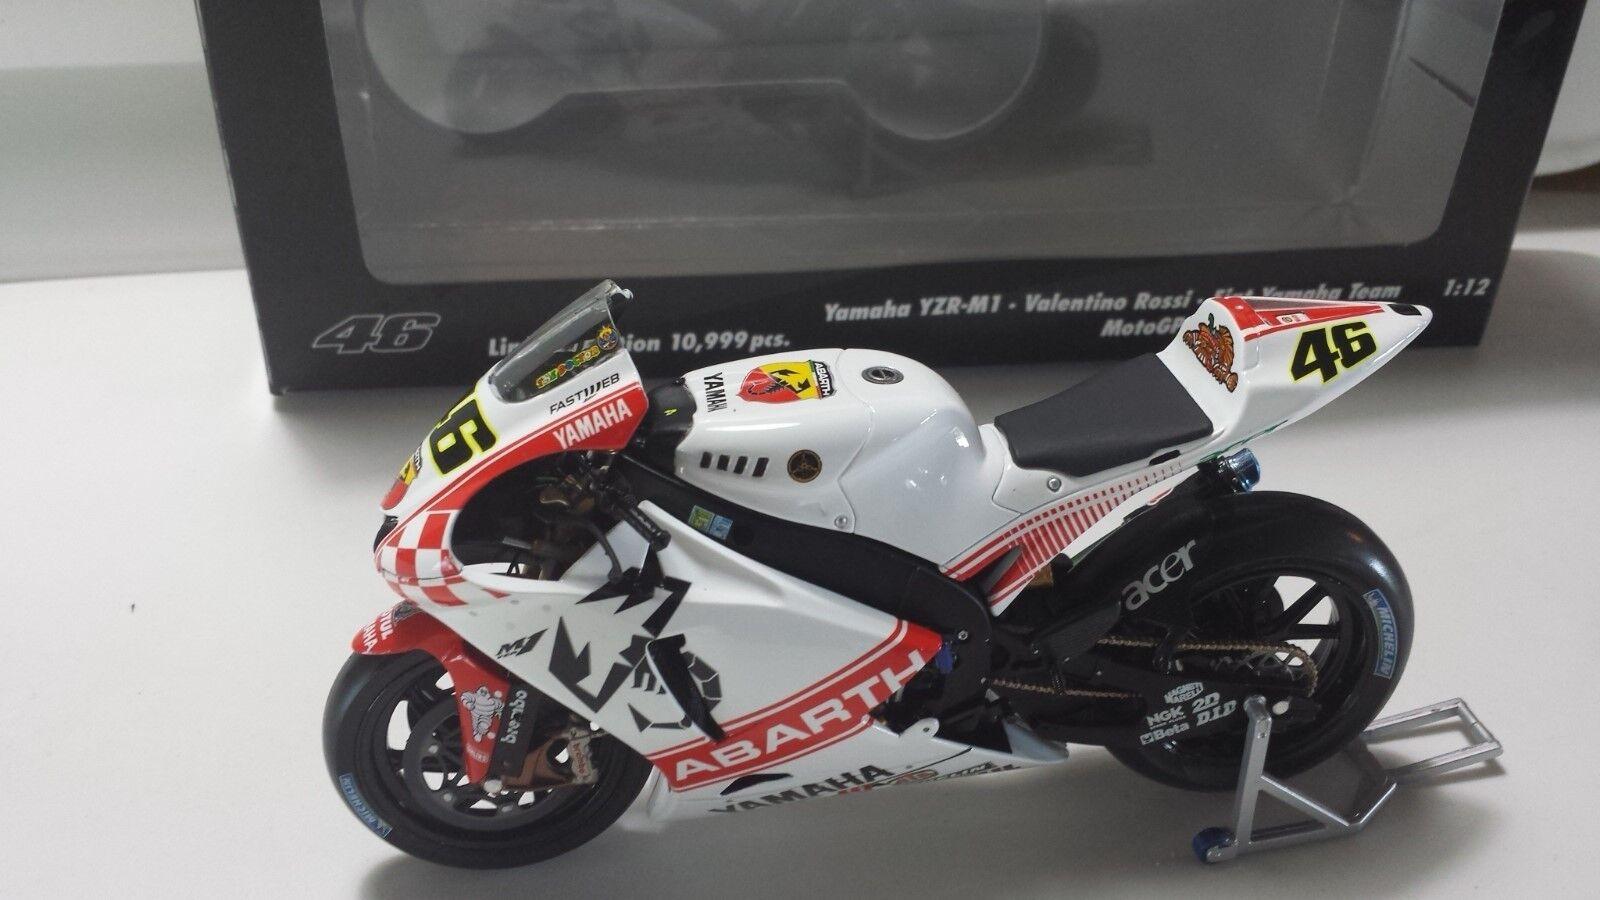 Valentino Rossi. Yamaha YZR-M1. MotoGP 2007. GP Australia. Minichamps 1 12